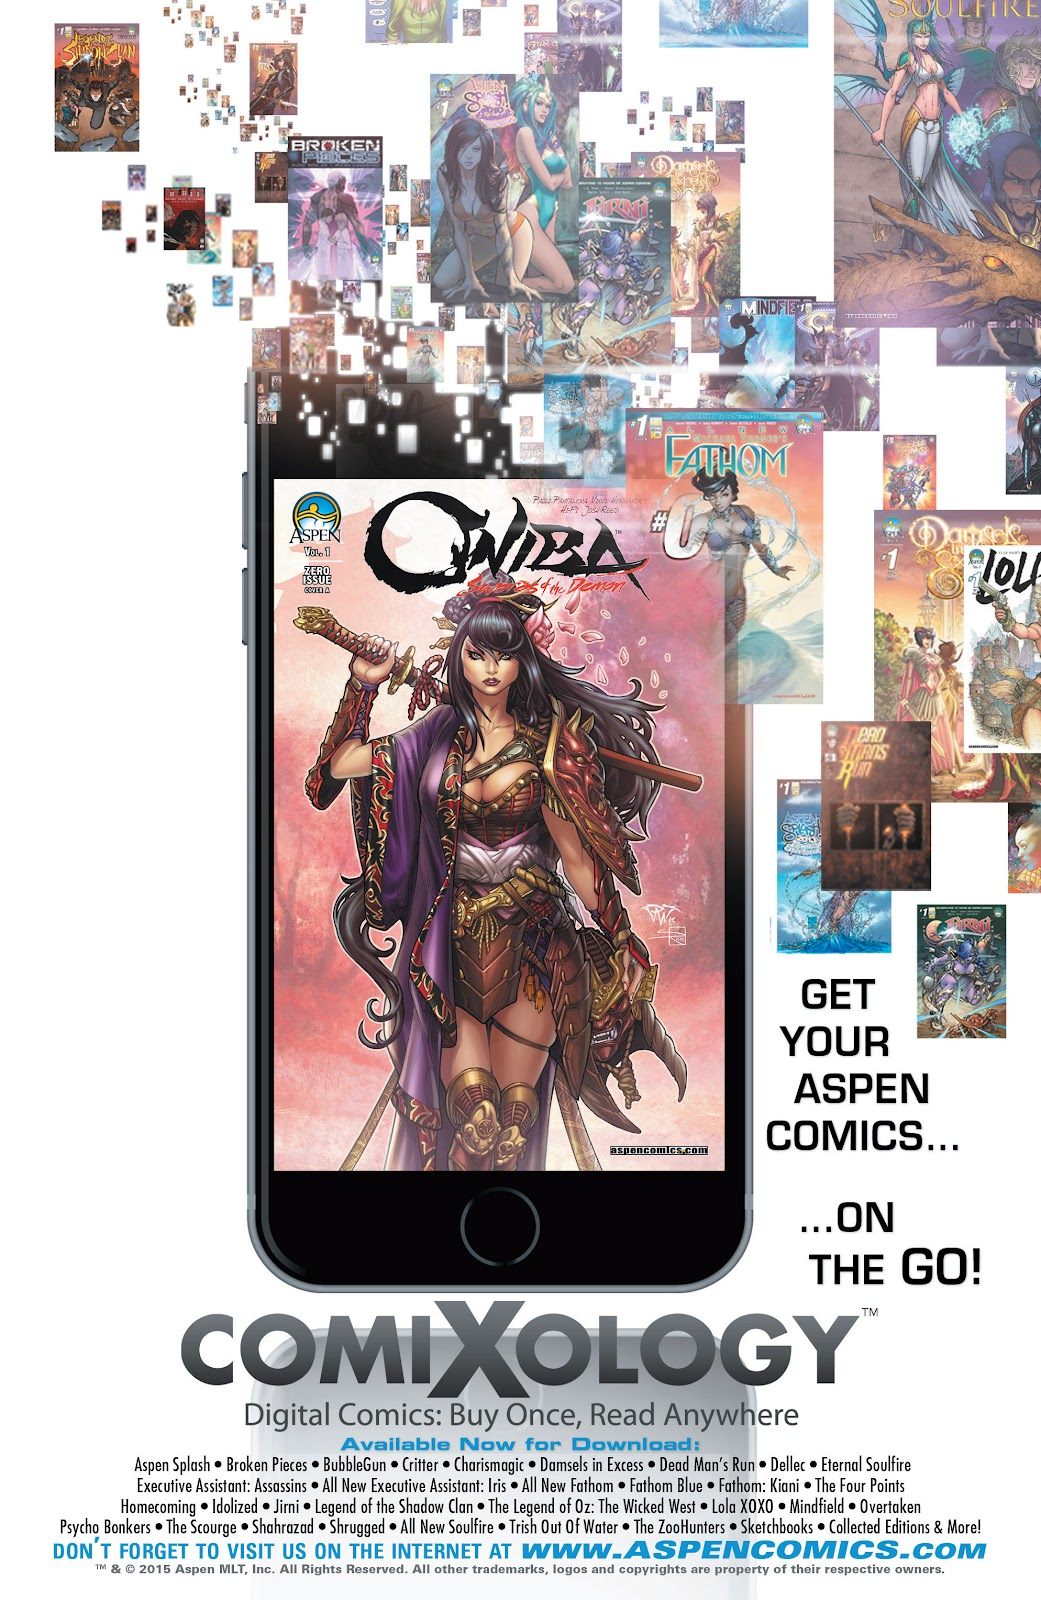 Read online Oniba: Swords of the Demon comic -  Issue # Full - 23